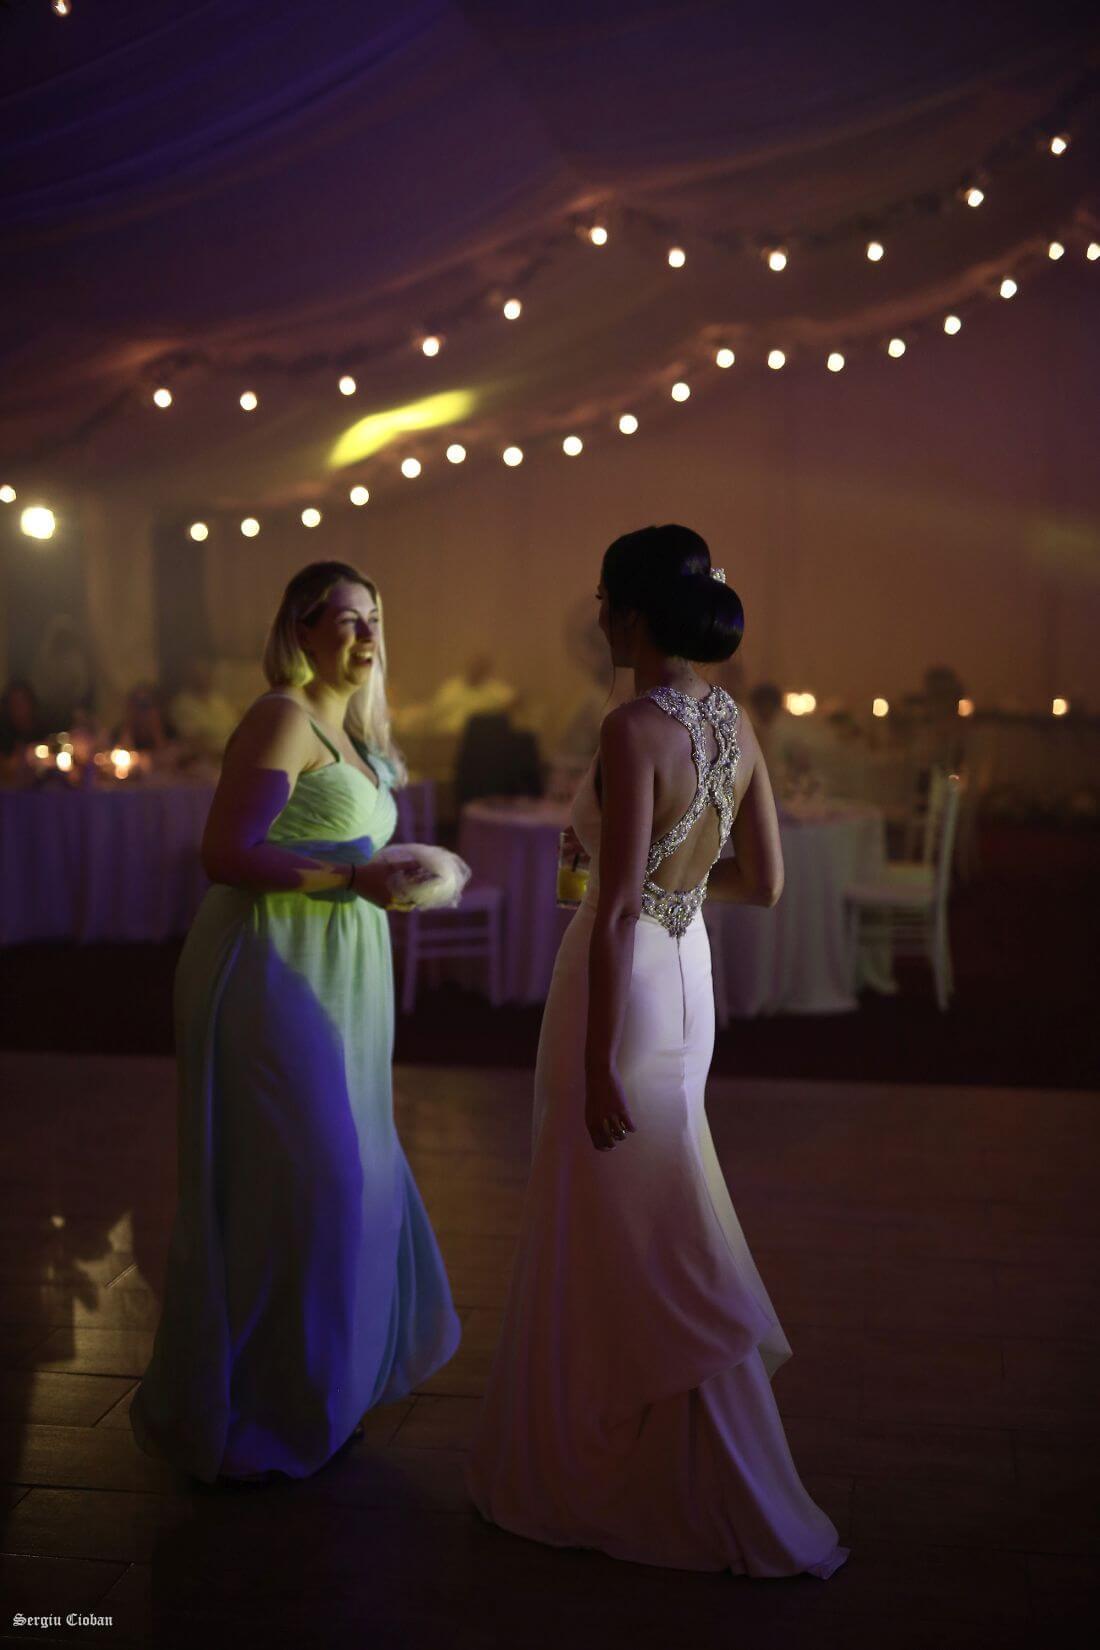 Iulia & Ludovic - IV- Sergiu Cioban - IDO-Weddings-nuntiinaerliber (24)